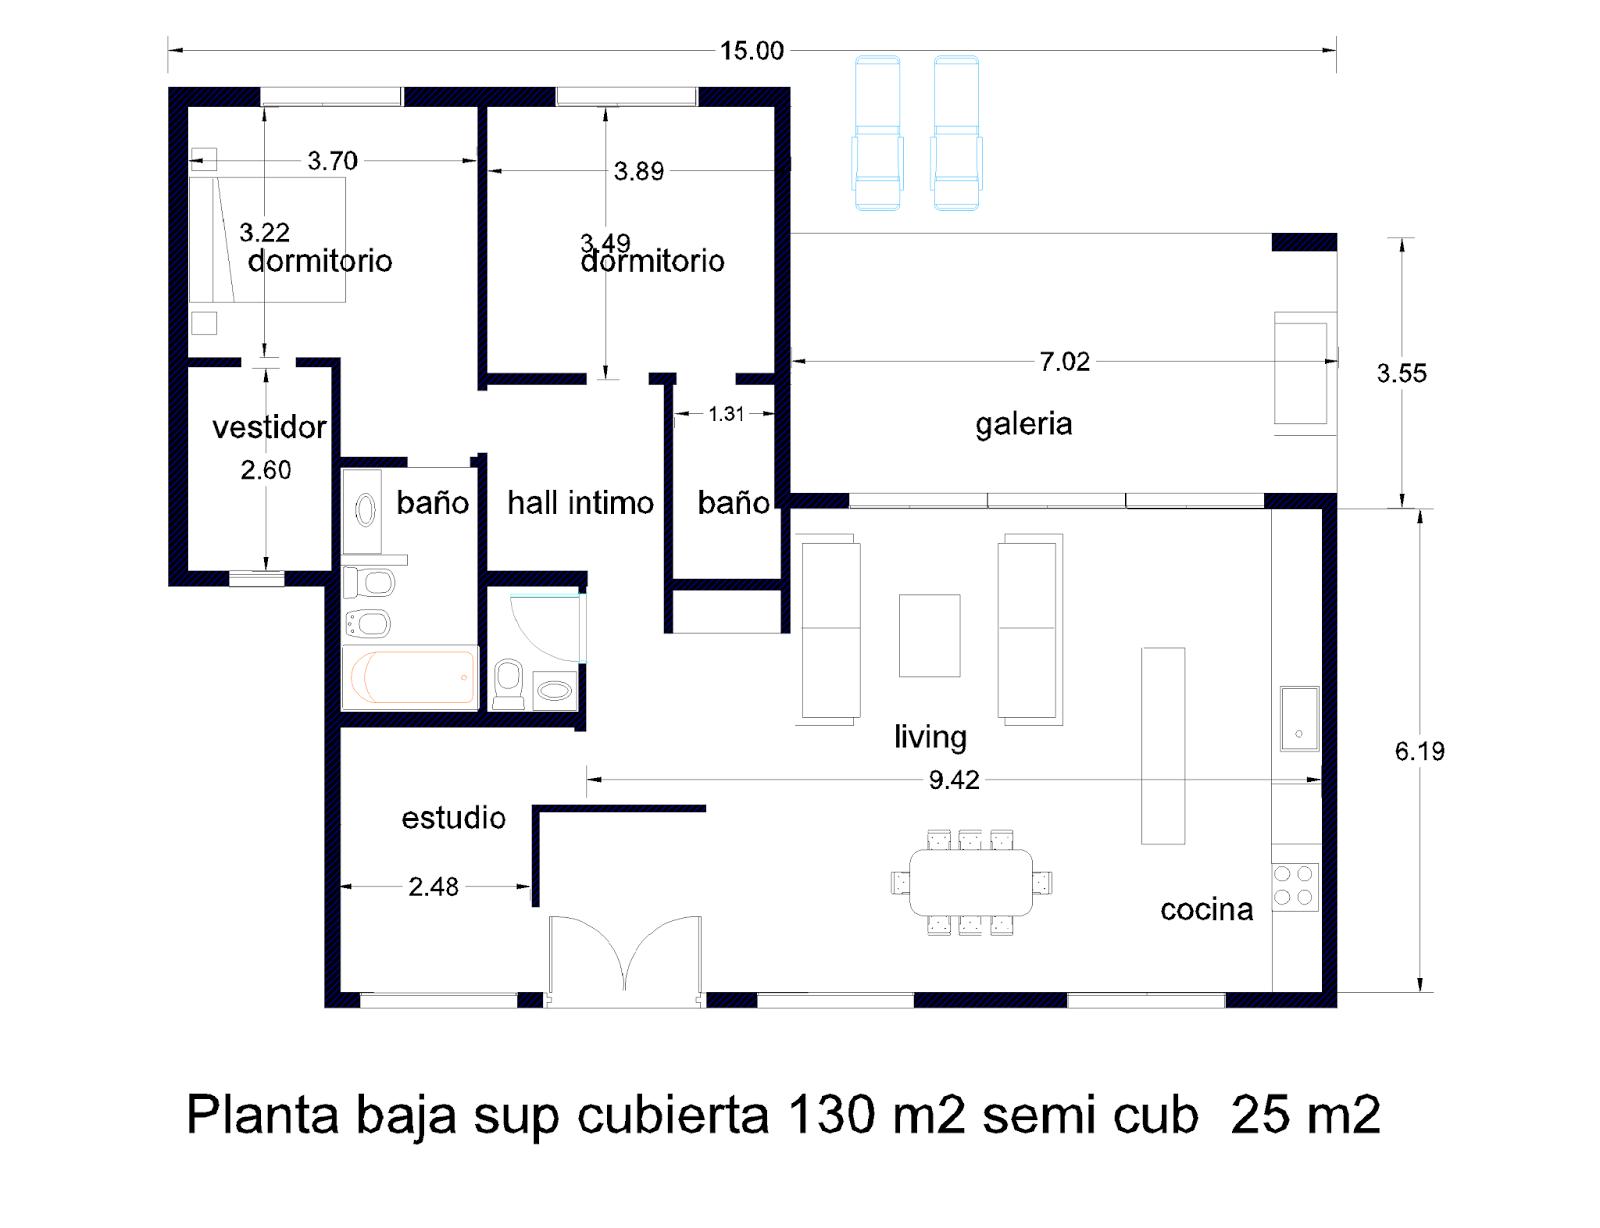 Arquitectura y dise o minimalista for Casa minimalista planos